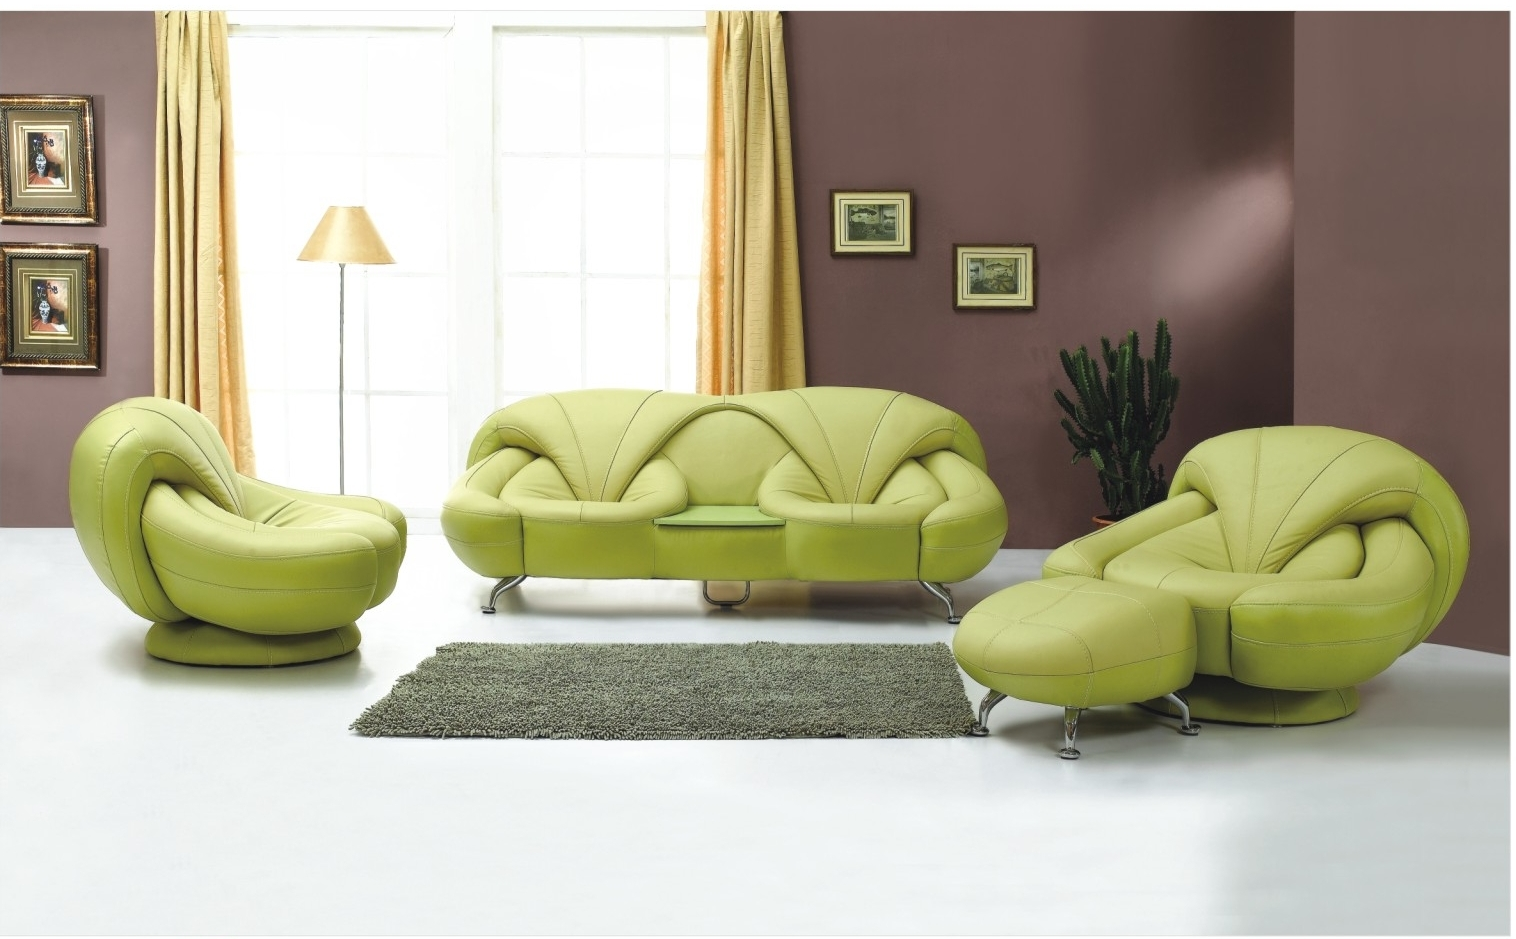 Modern living room furniture designs ideas. | An Interior Design